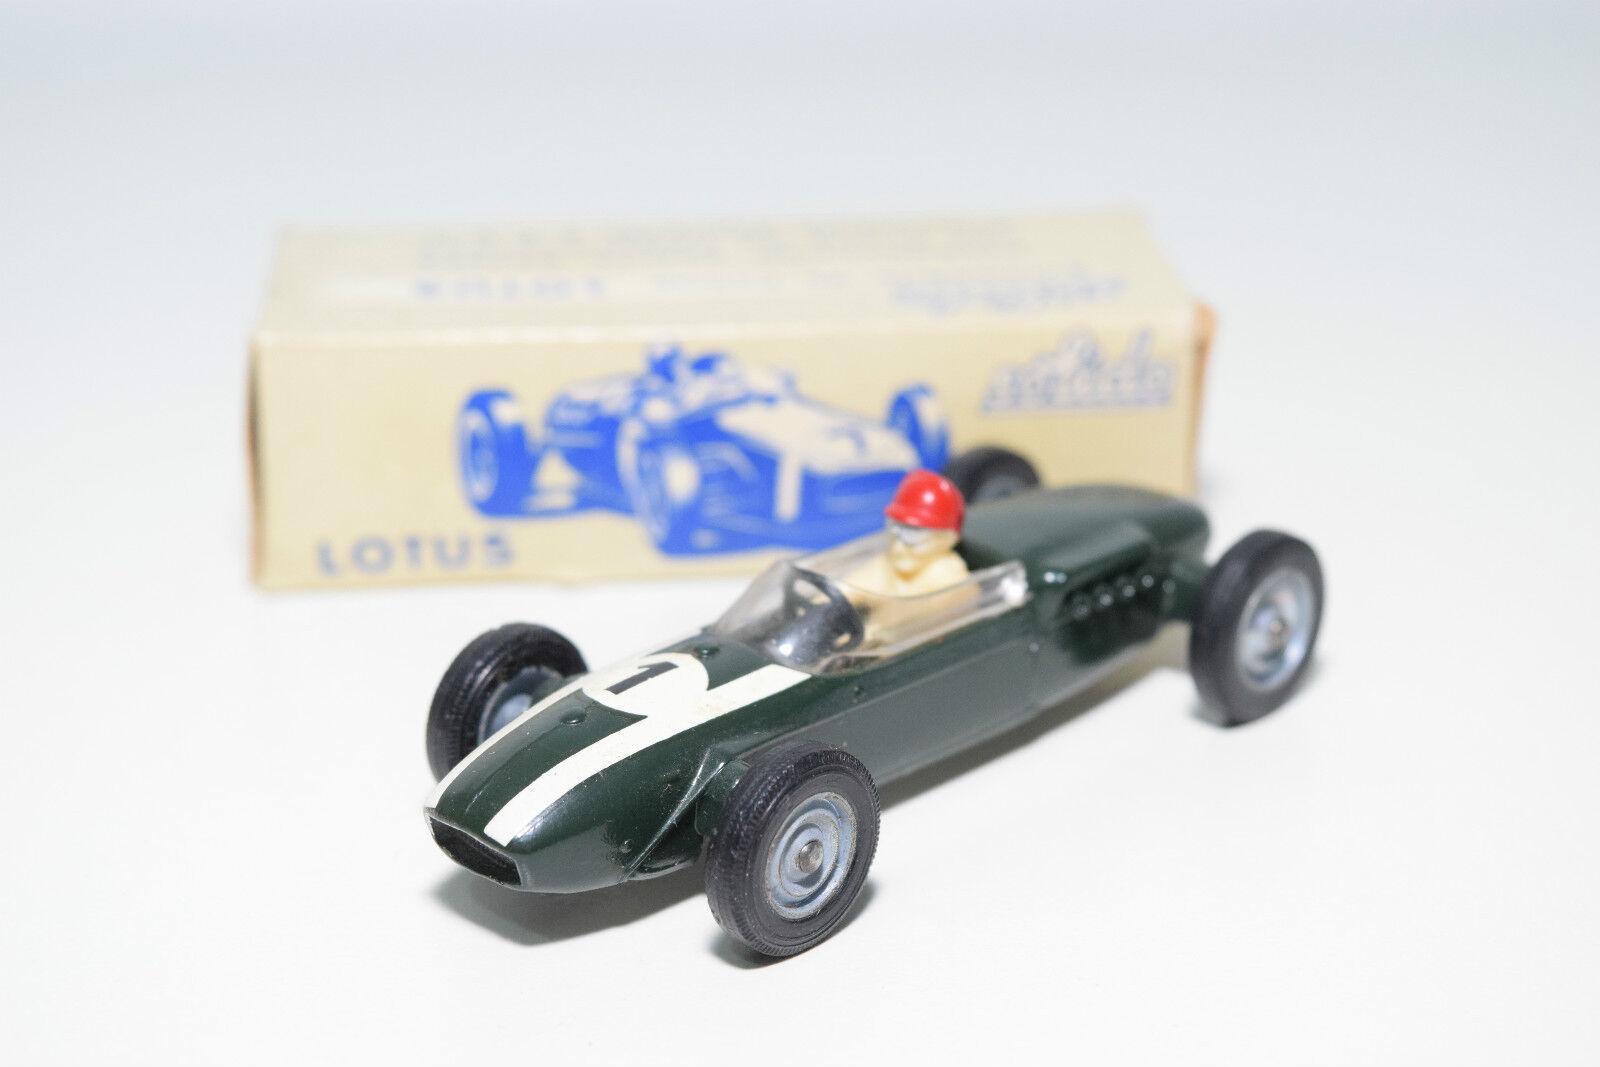 Solido 116 lotus formule 1 formel - 1 - f1 - rennwagen grüner minze umzingelt